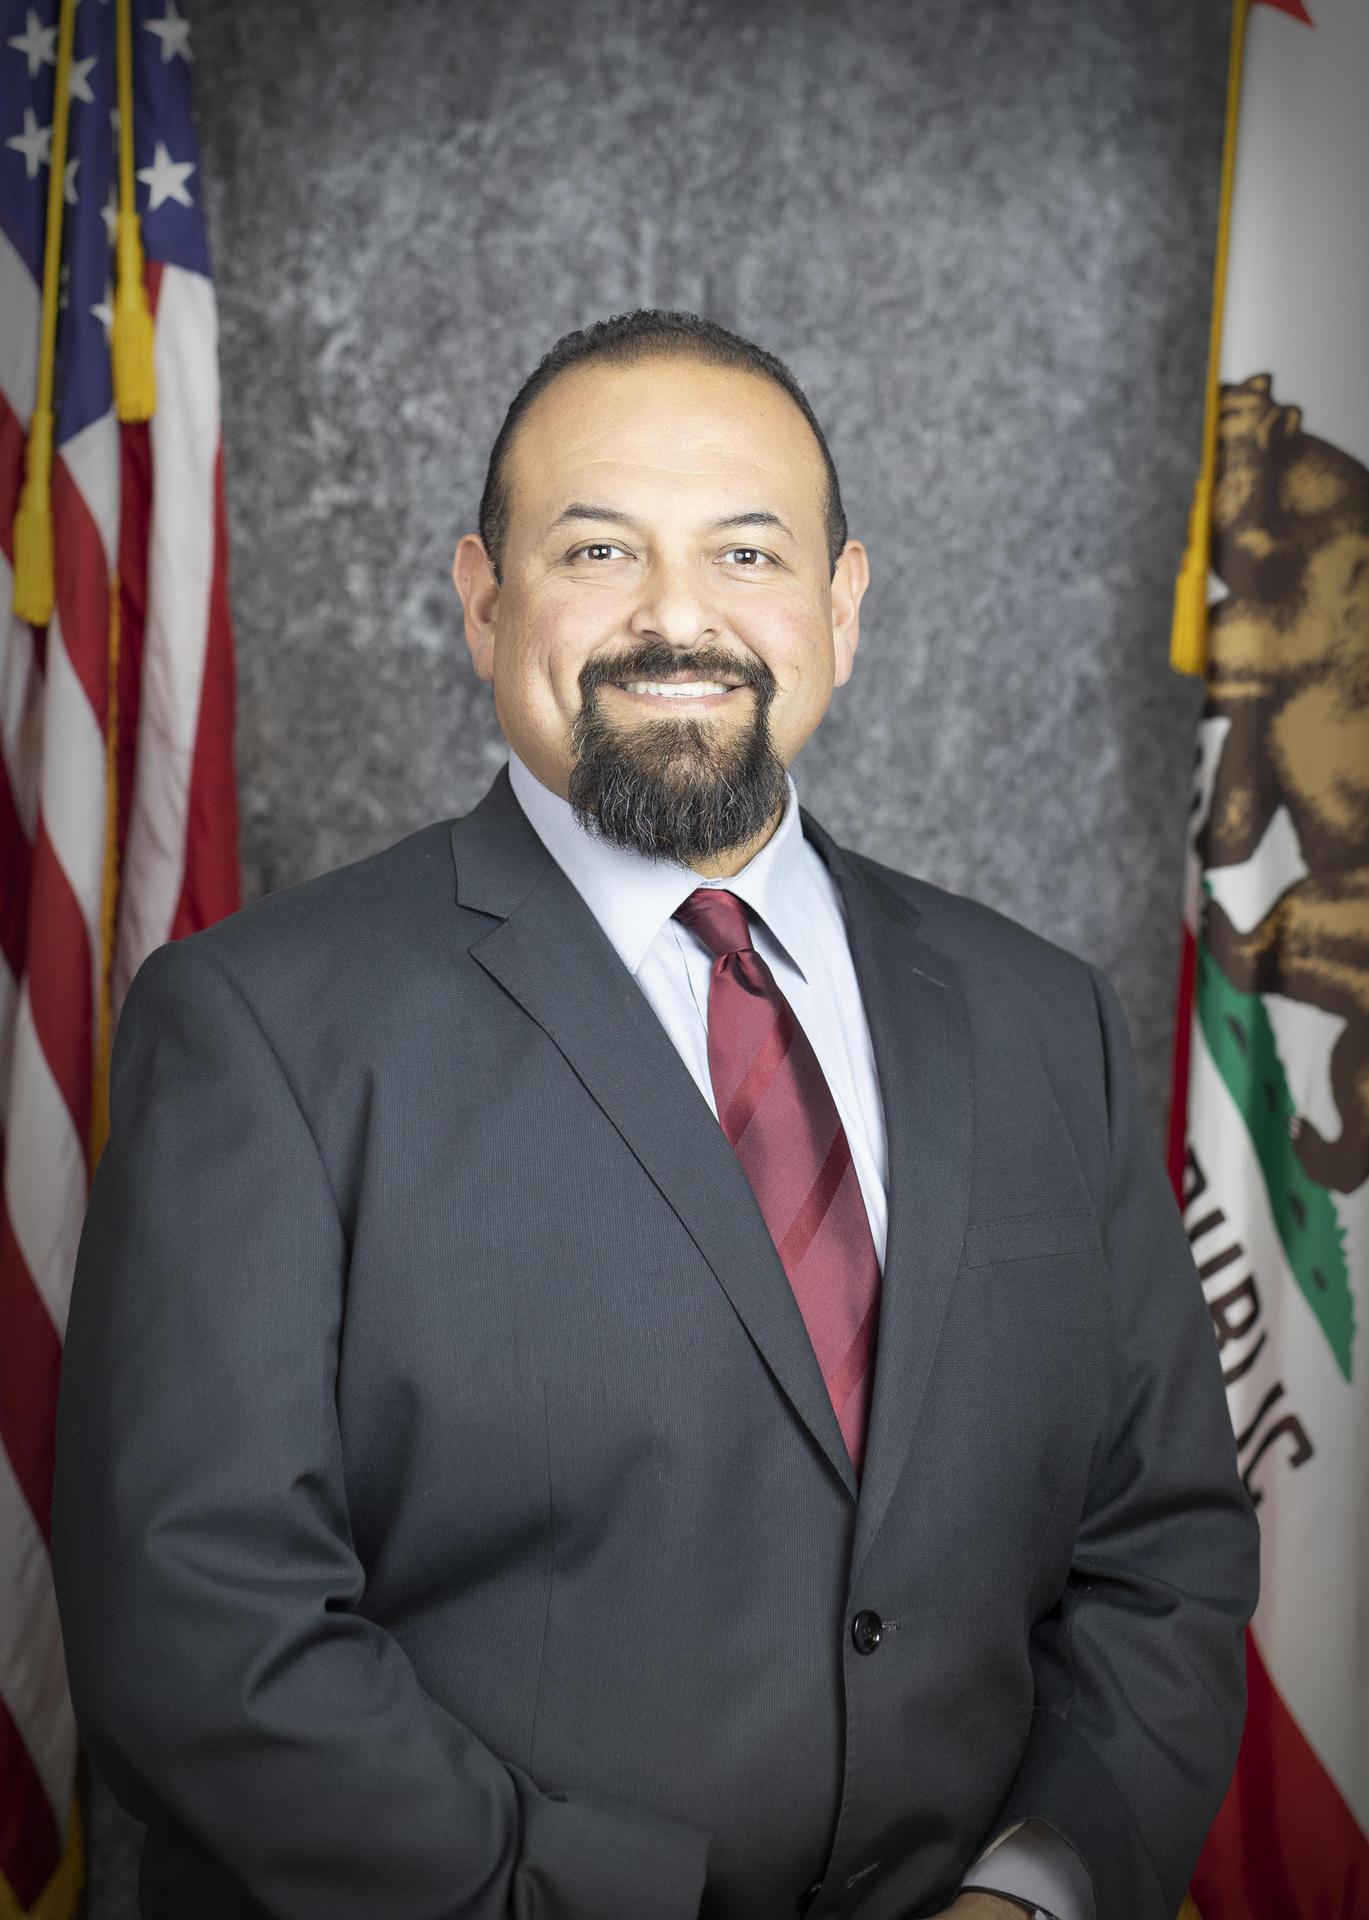 Marcus Hernandez